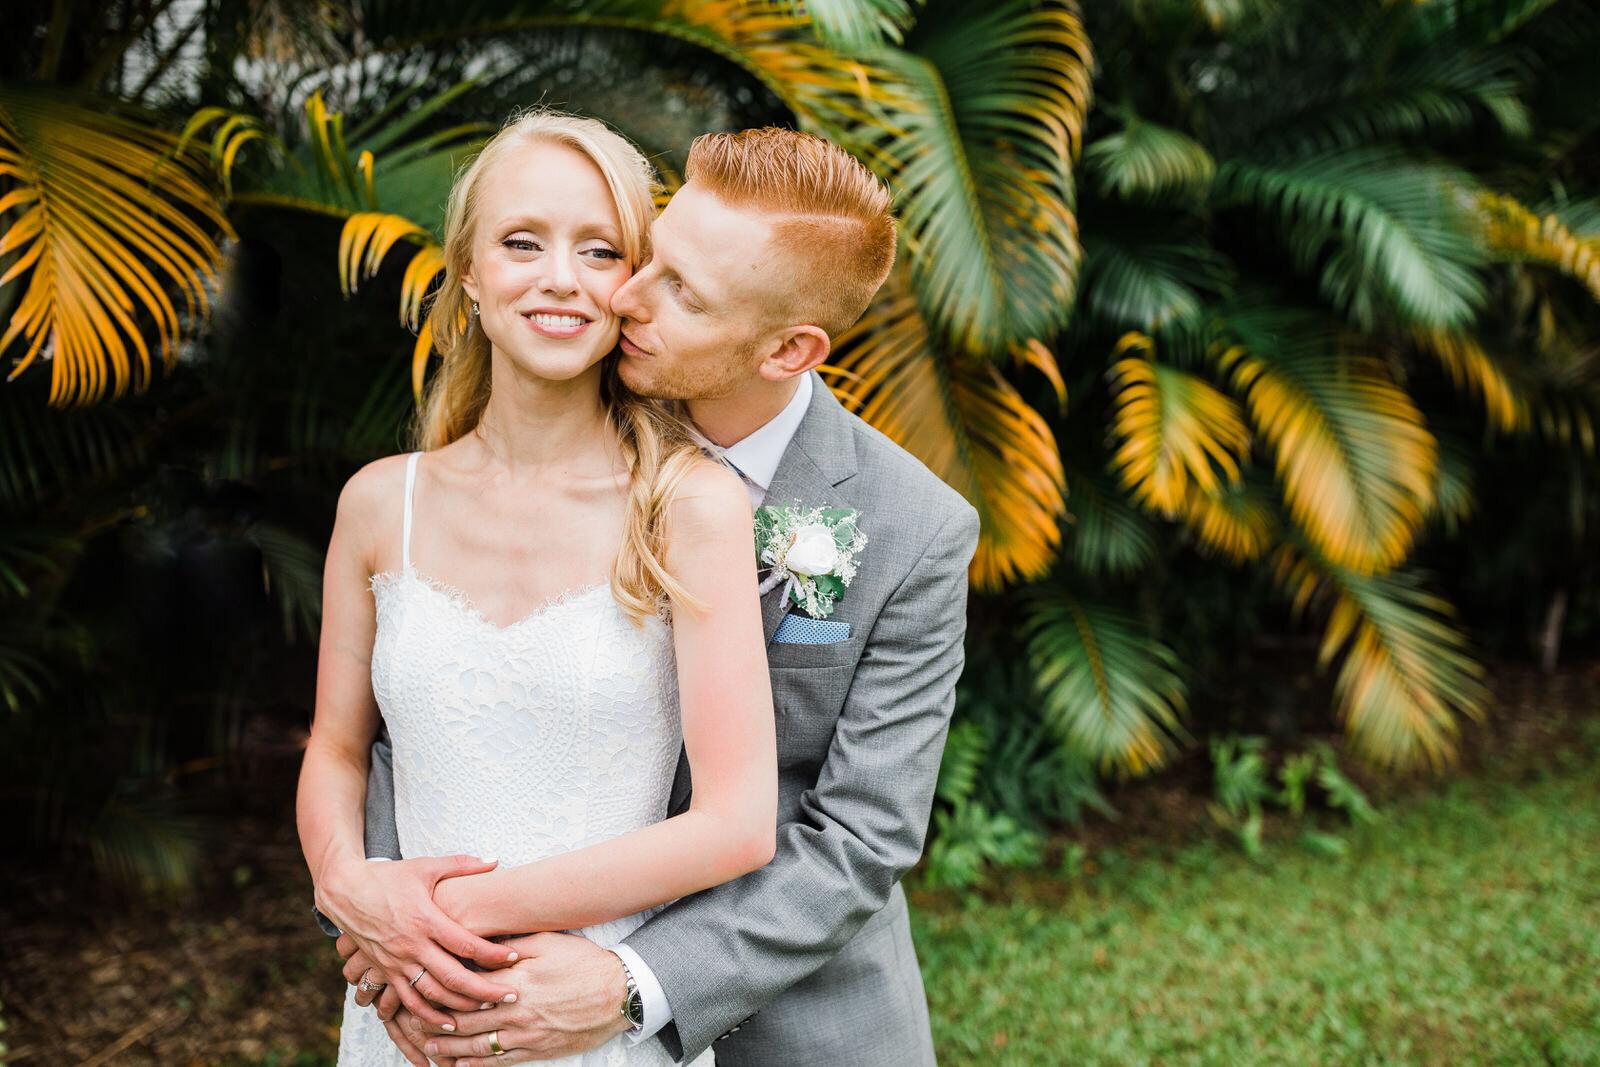 small-wedding-hawaii-destination-hilton-coconut-island-0066.jpg